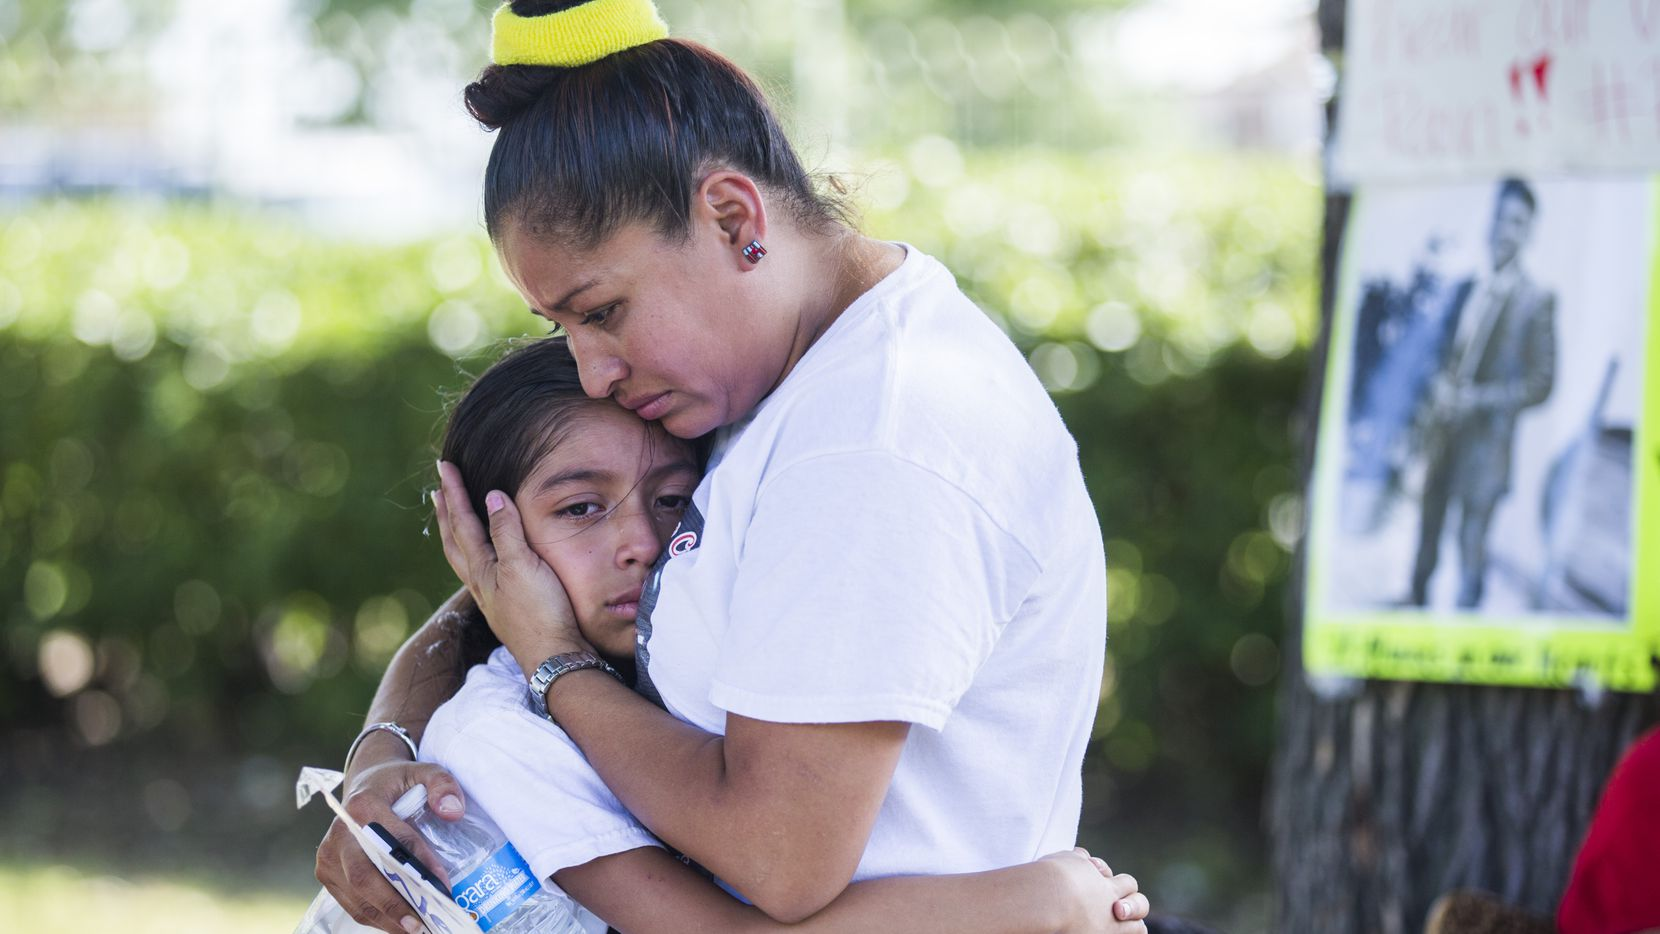 Jose Cruz's mother, Ana Henriquez, comforts Cruz's sister, Stephanie Eschriche, near Cruz's burial site on Friday, September 9, 2016 at Crown Hill Memorial Park in Dallas.